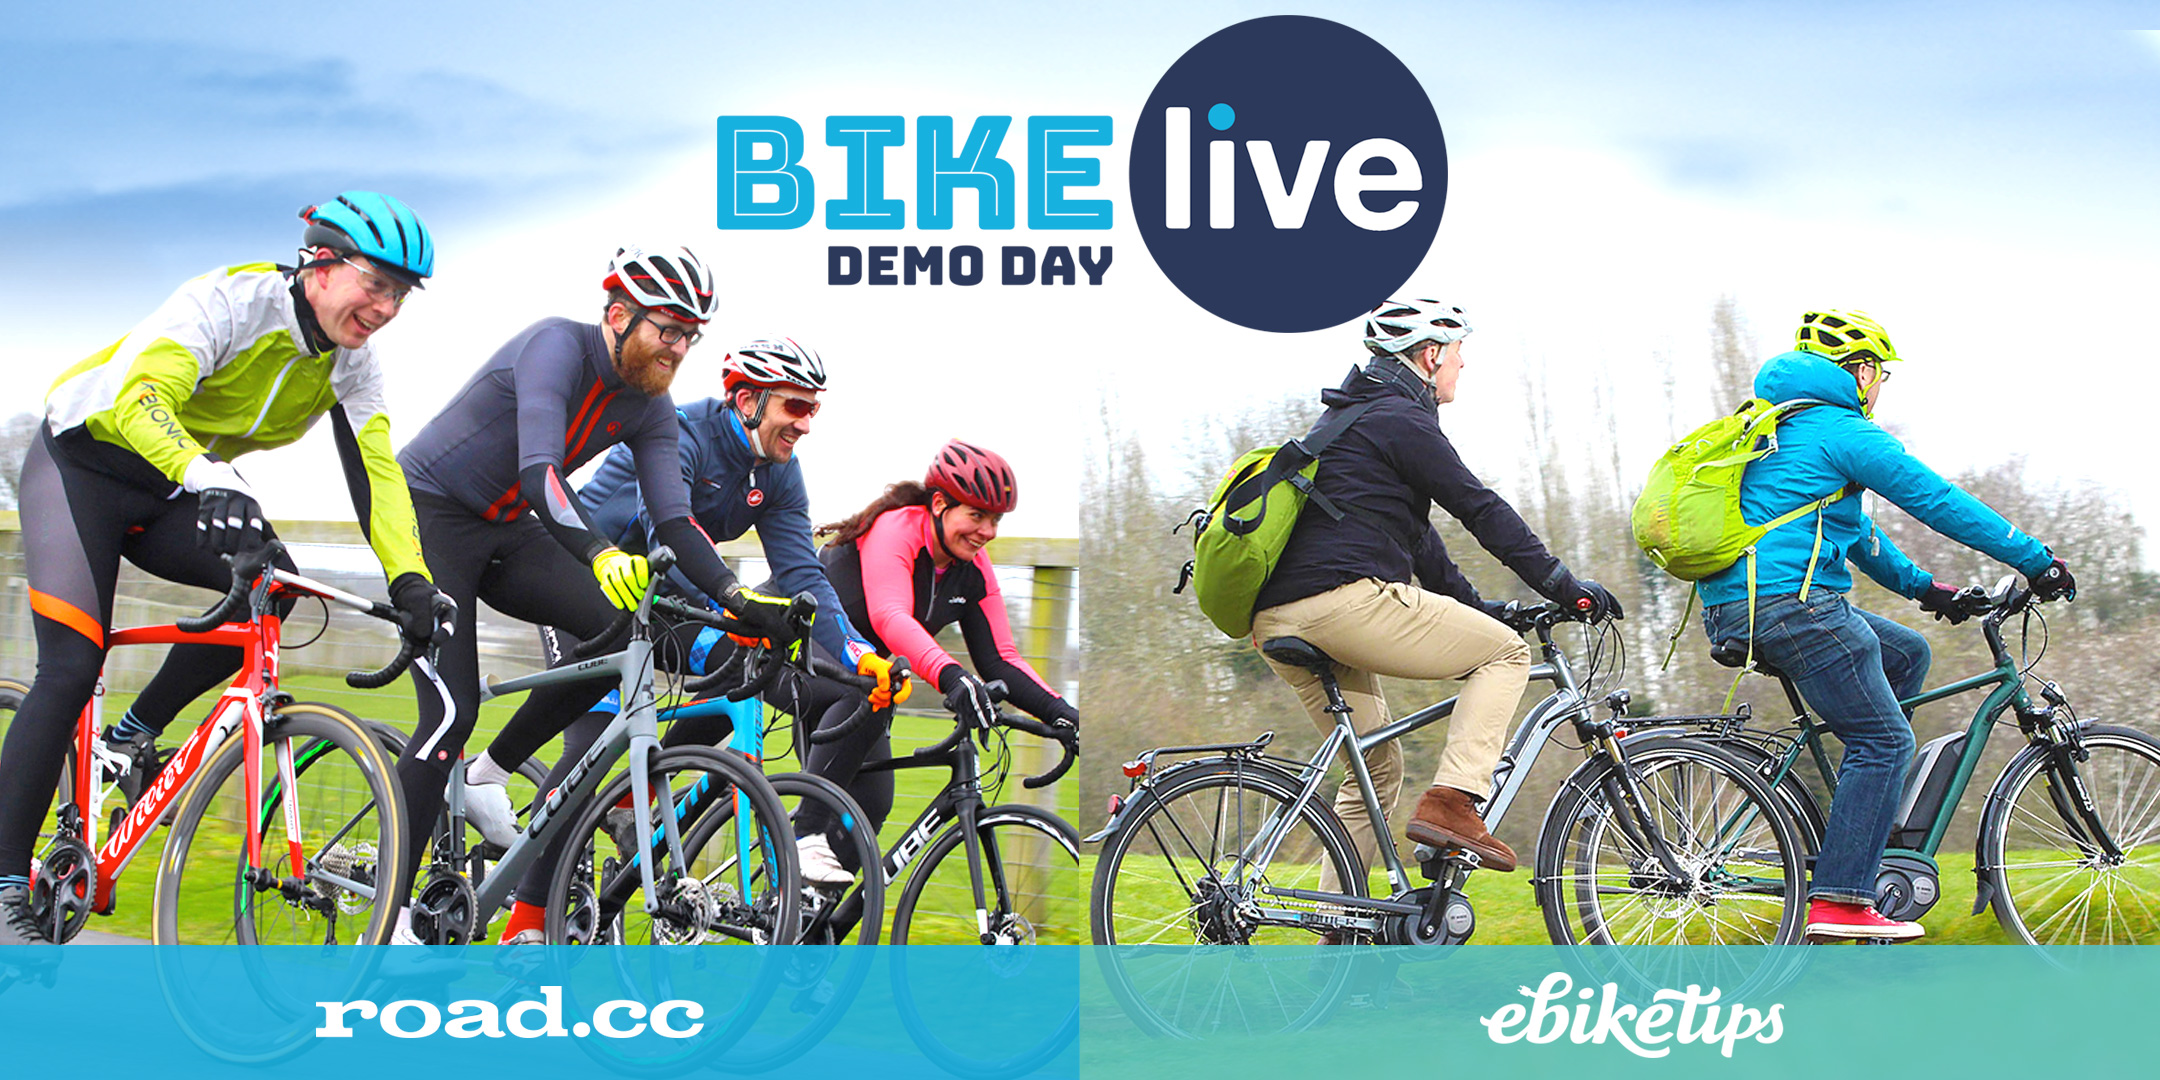 BikeLive Bath demo day road.cc live Feb 2018